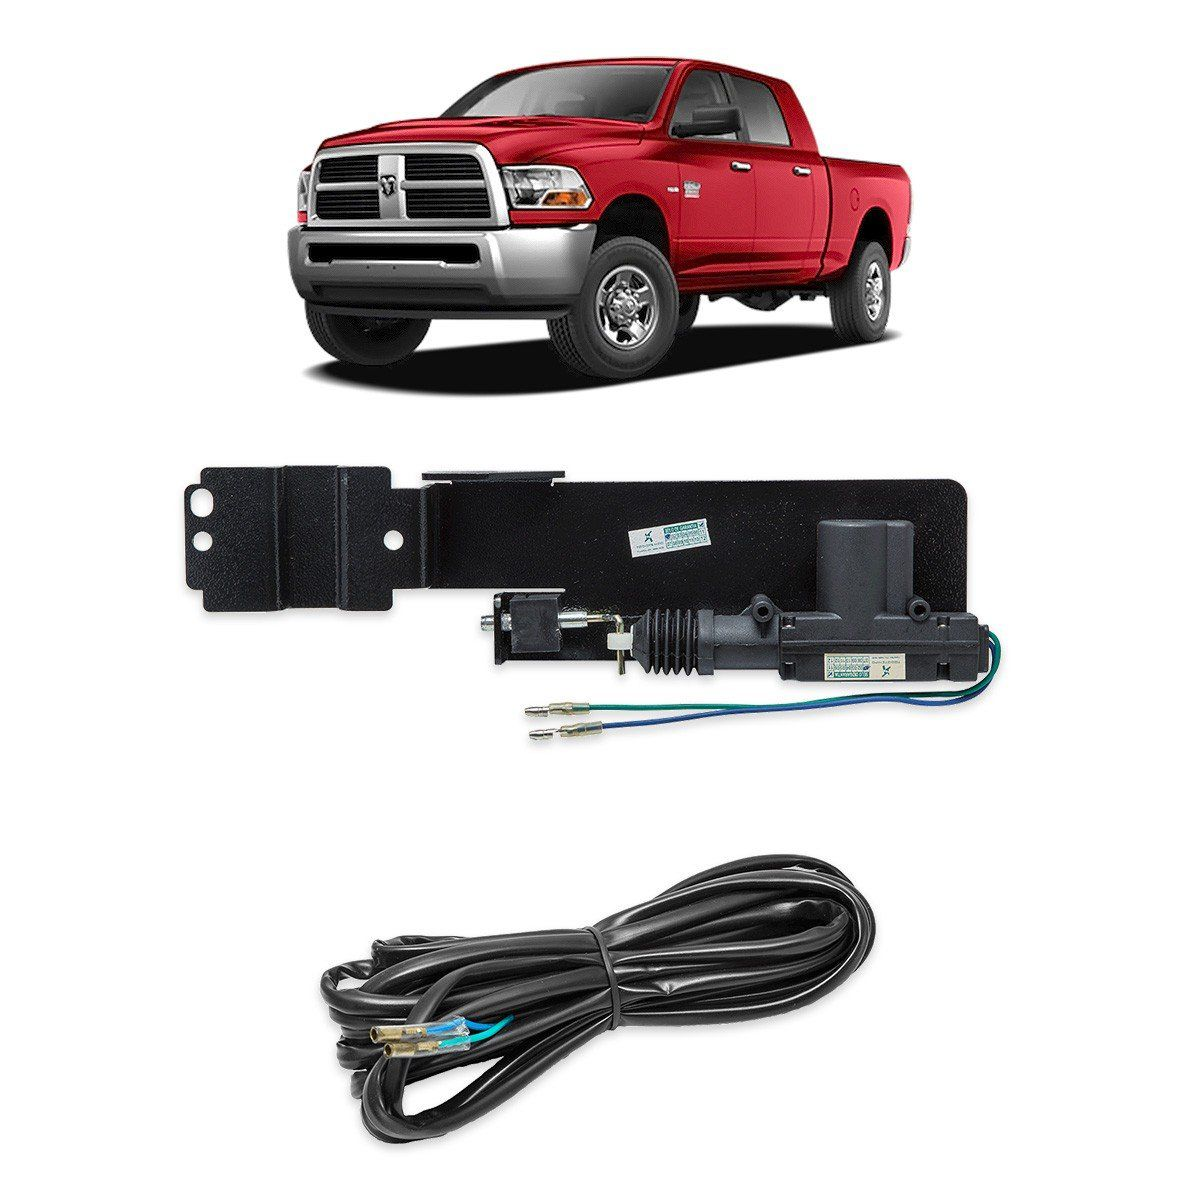 Tranca Tampa Trava Elétrica Caçamba Dodge Ram 1500